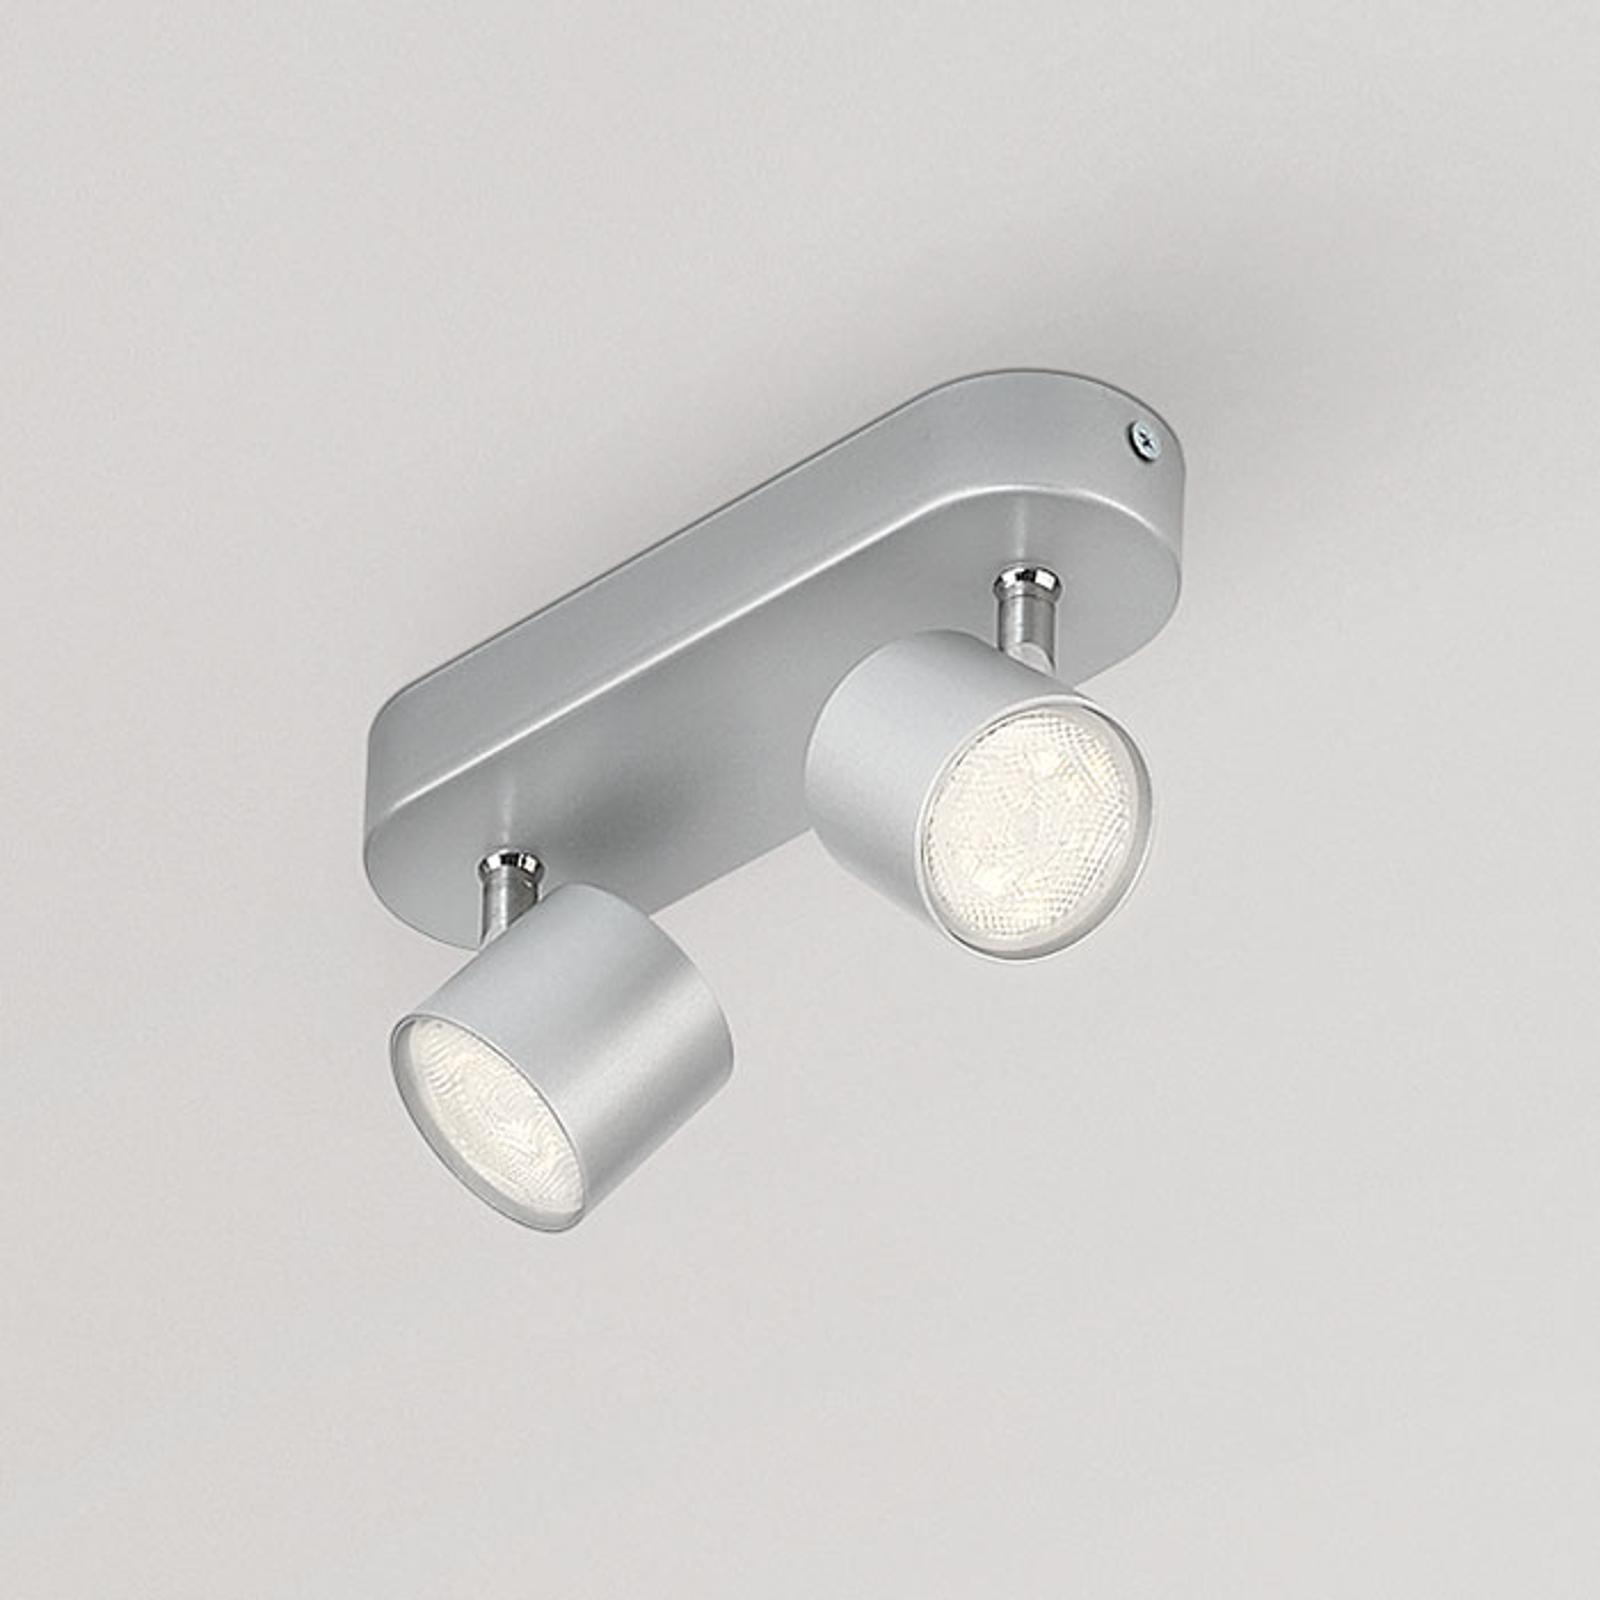 Star LED taklampe, stillbar, to lyskilder